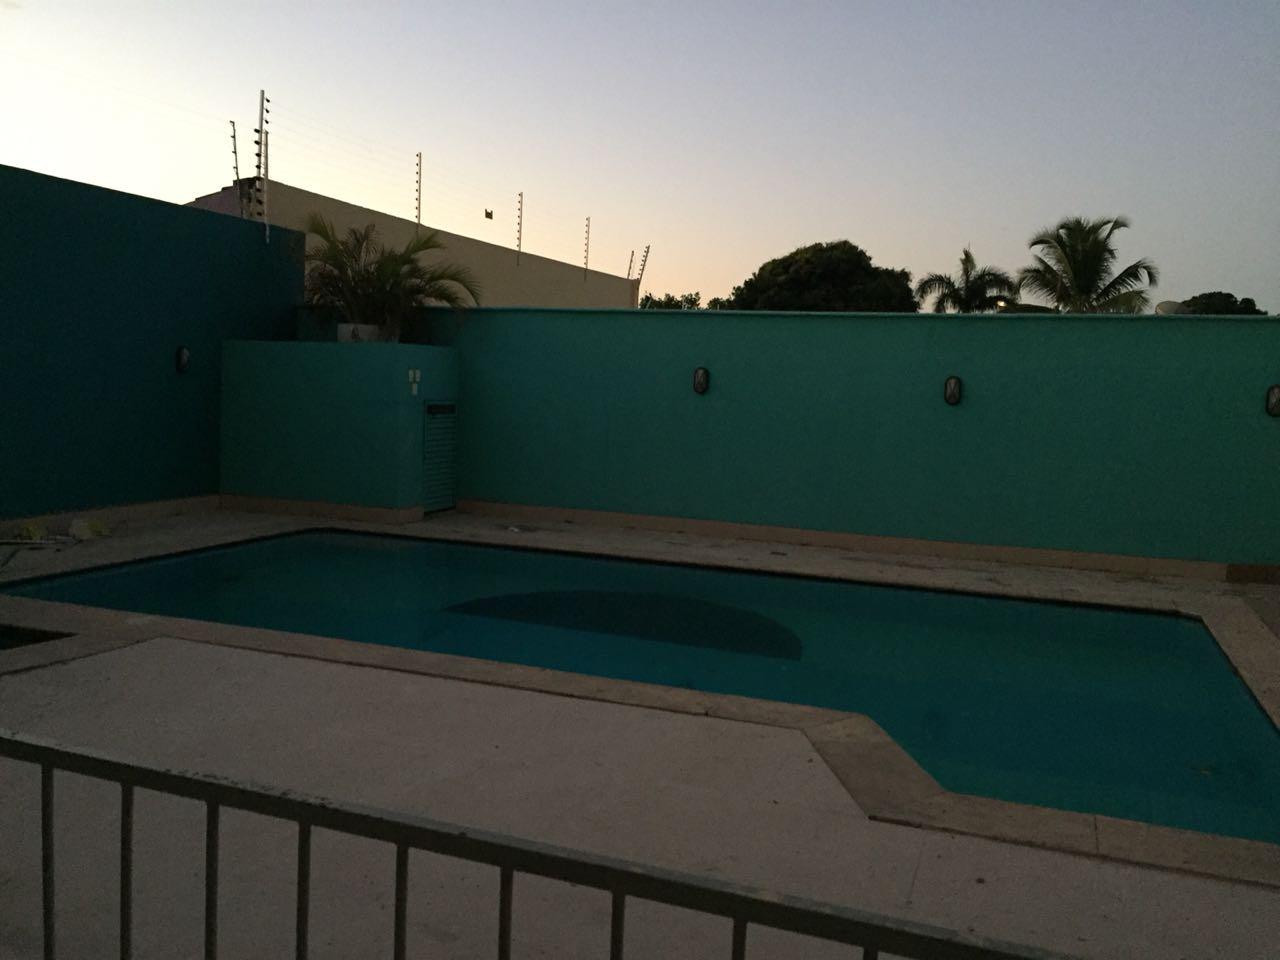 Apartamento  com 3 quartos sendo 1 Suíte no Jardim Santa Marta, Cuiabá  - MT